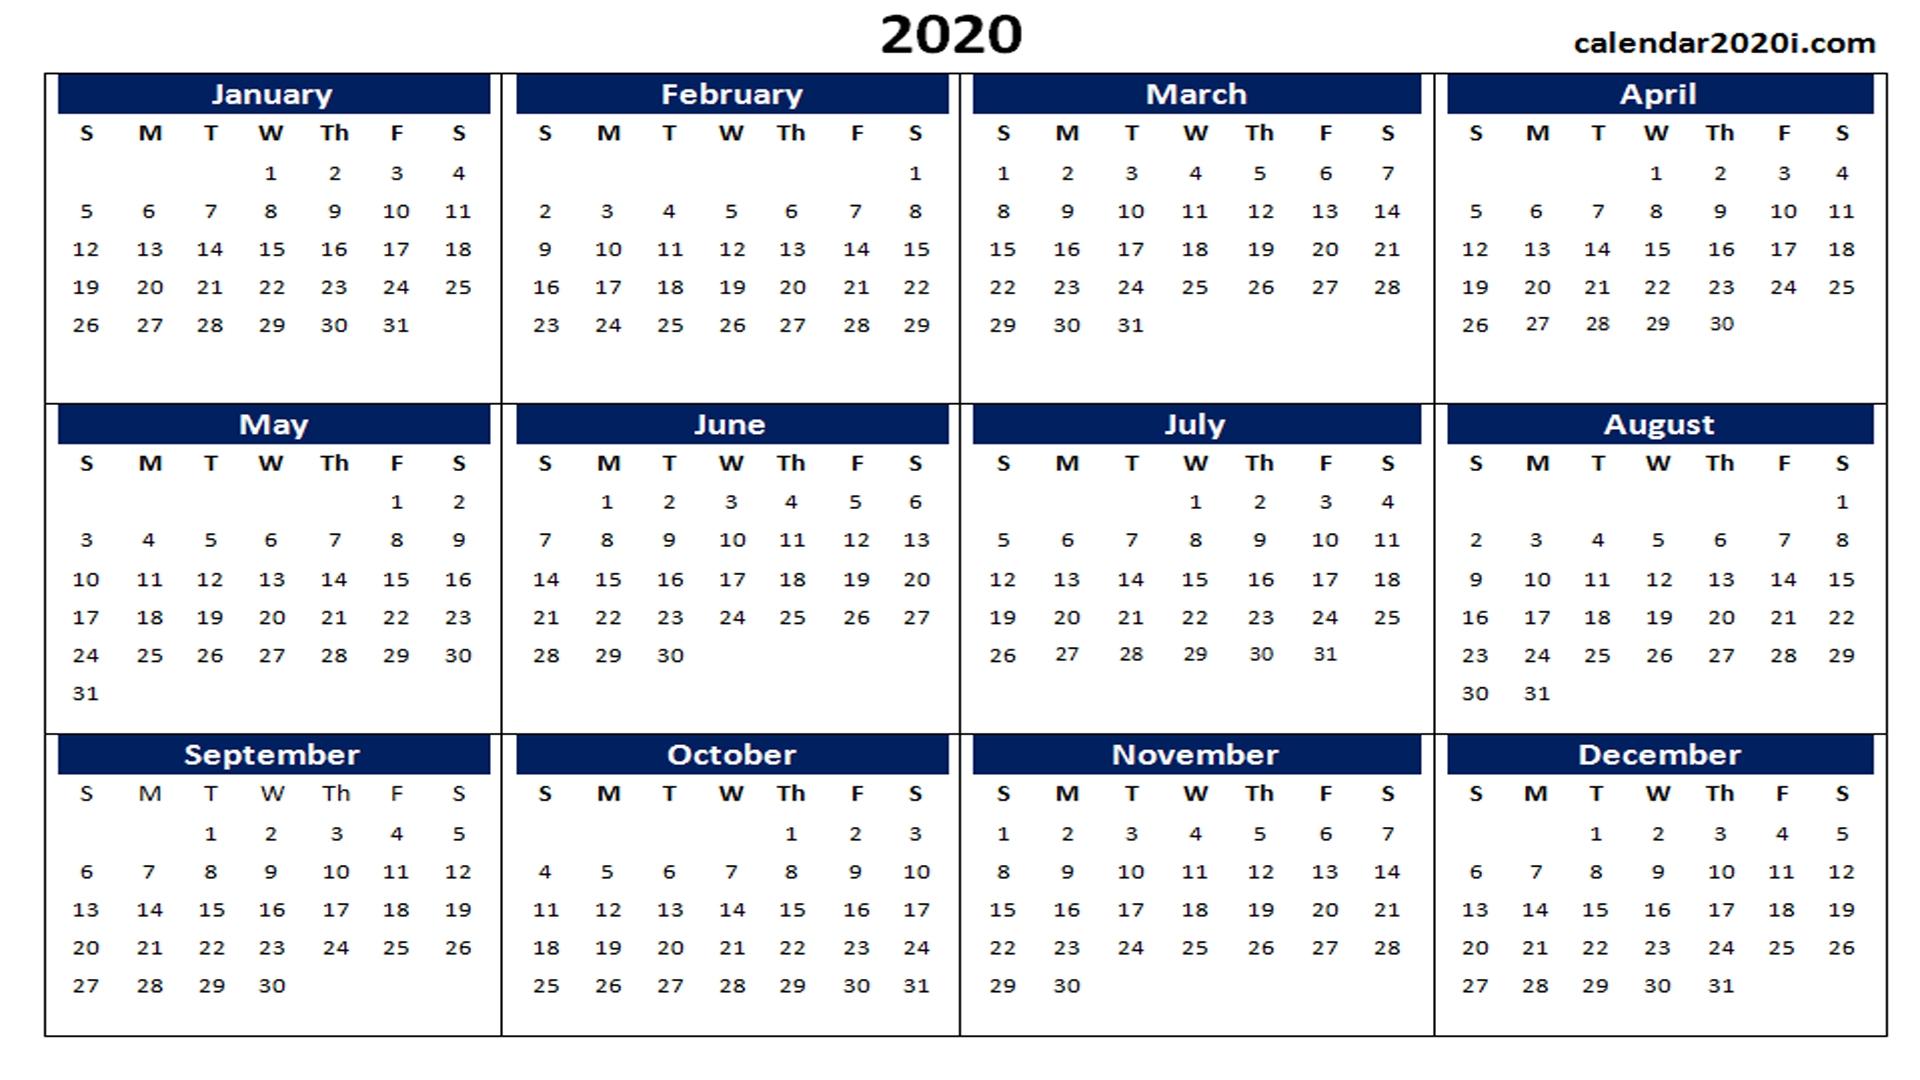 Blank 2020 Calendar Printable Templates   Calendar 2020-Blank 2020 Calendar Printable 2 Month